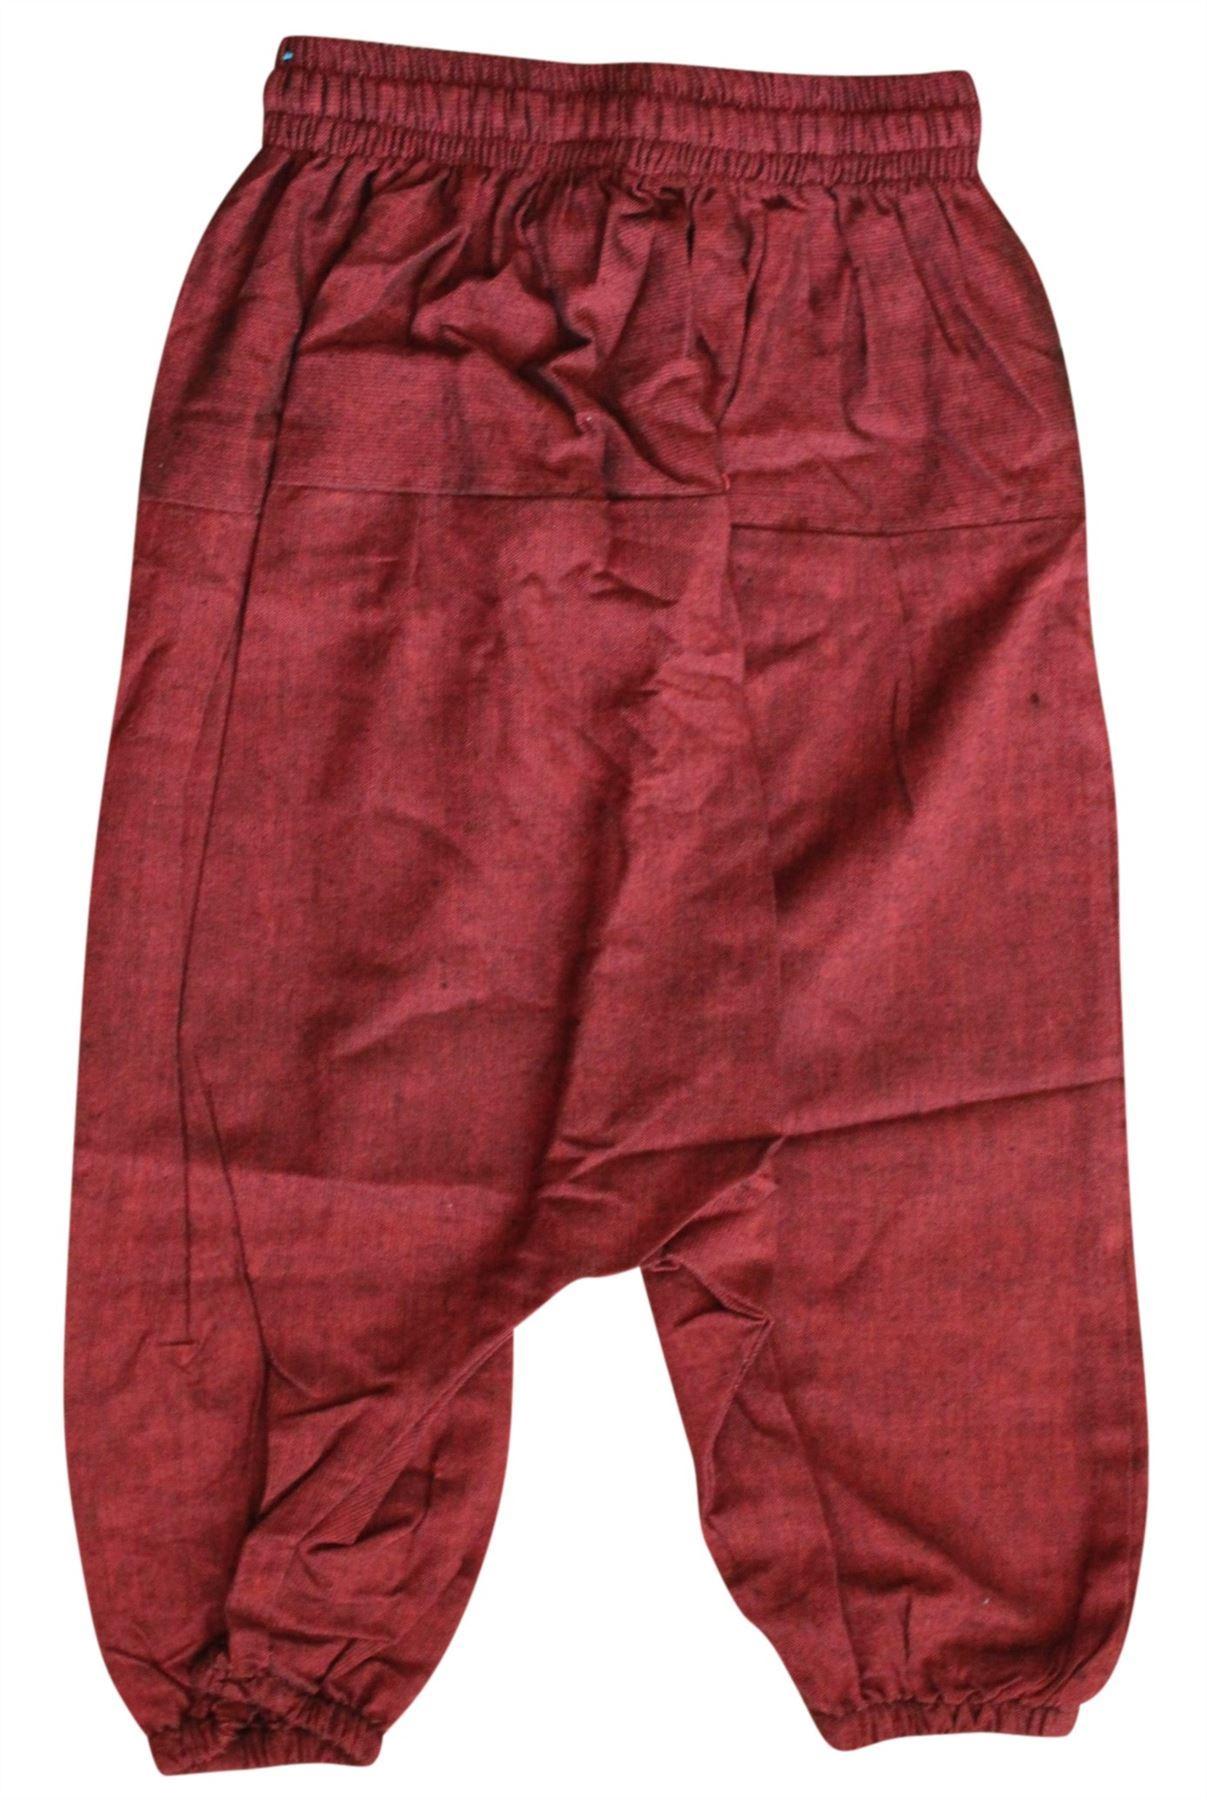 Children Hippie Harem Loose Boho Trouser Hippy Colorful Kids Retro Comfy  Pants